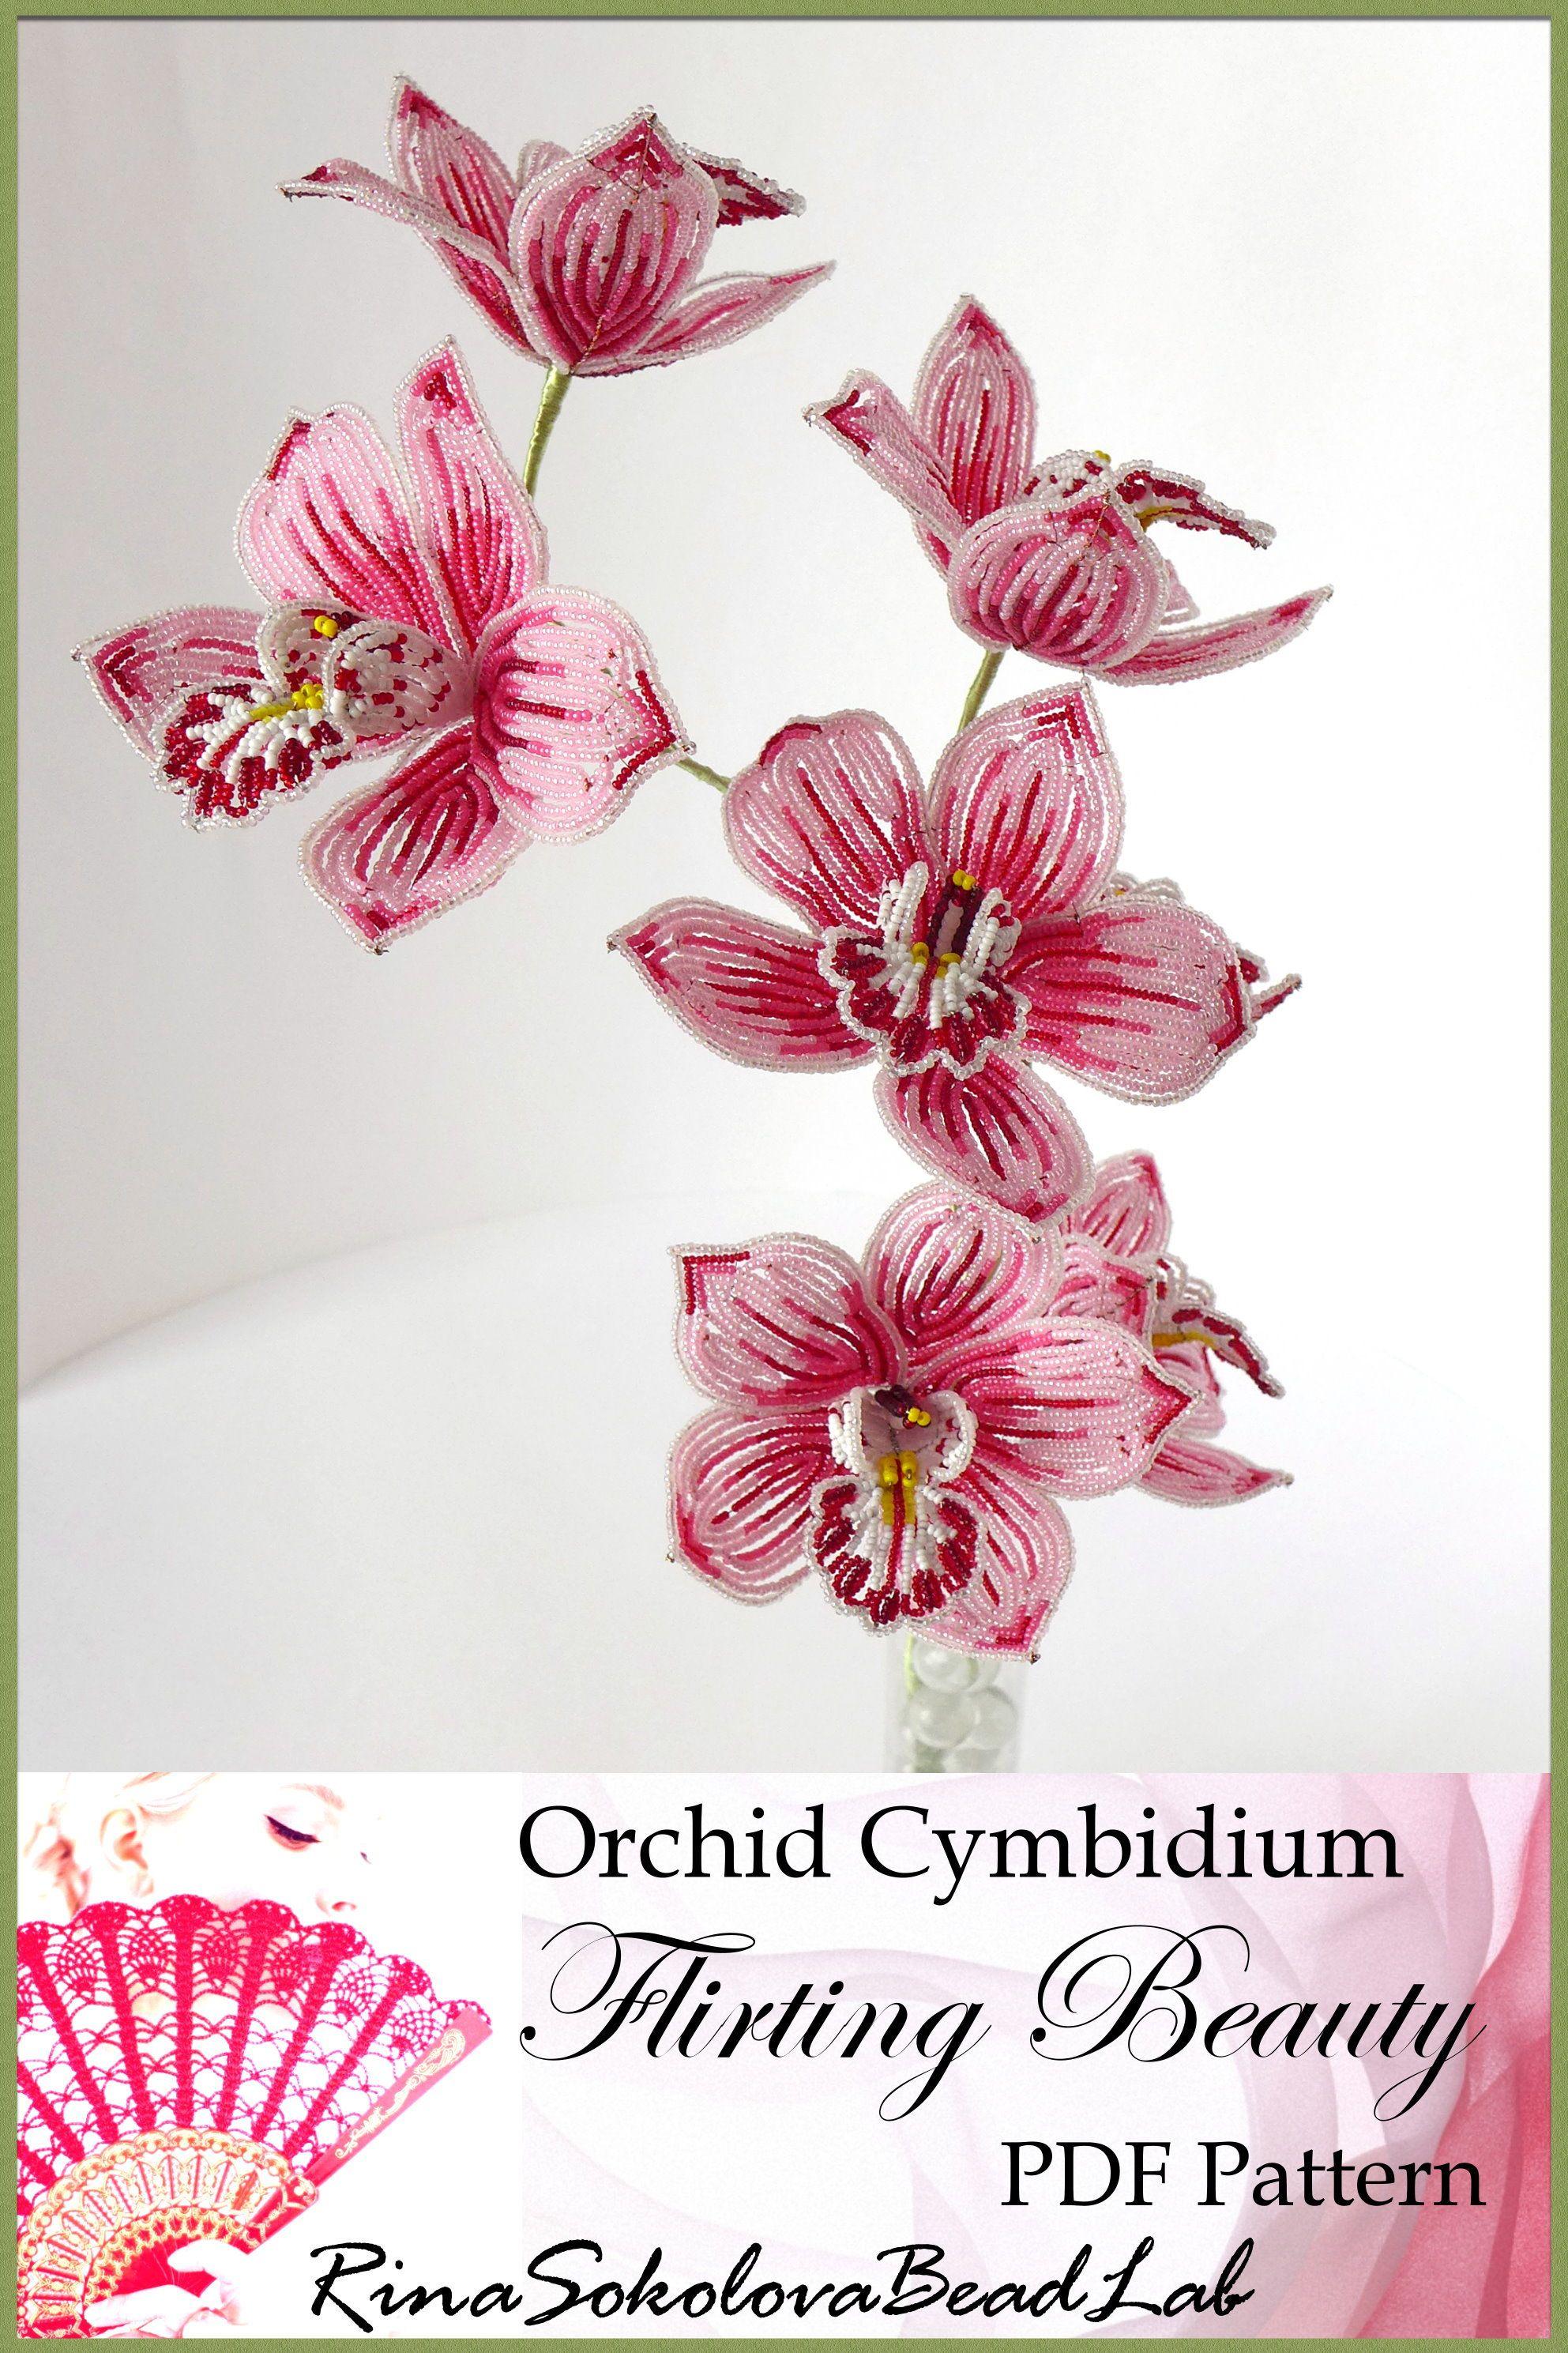 Pdf pattern french beaded cymbidium orchid seed bead flowers